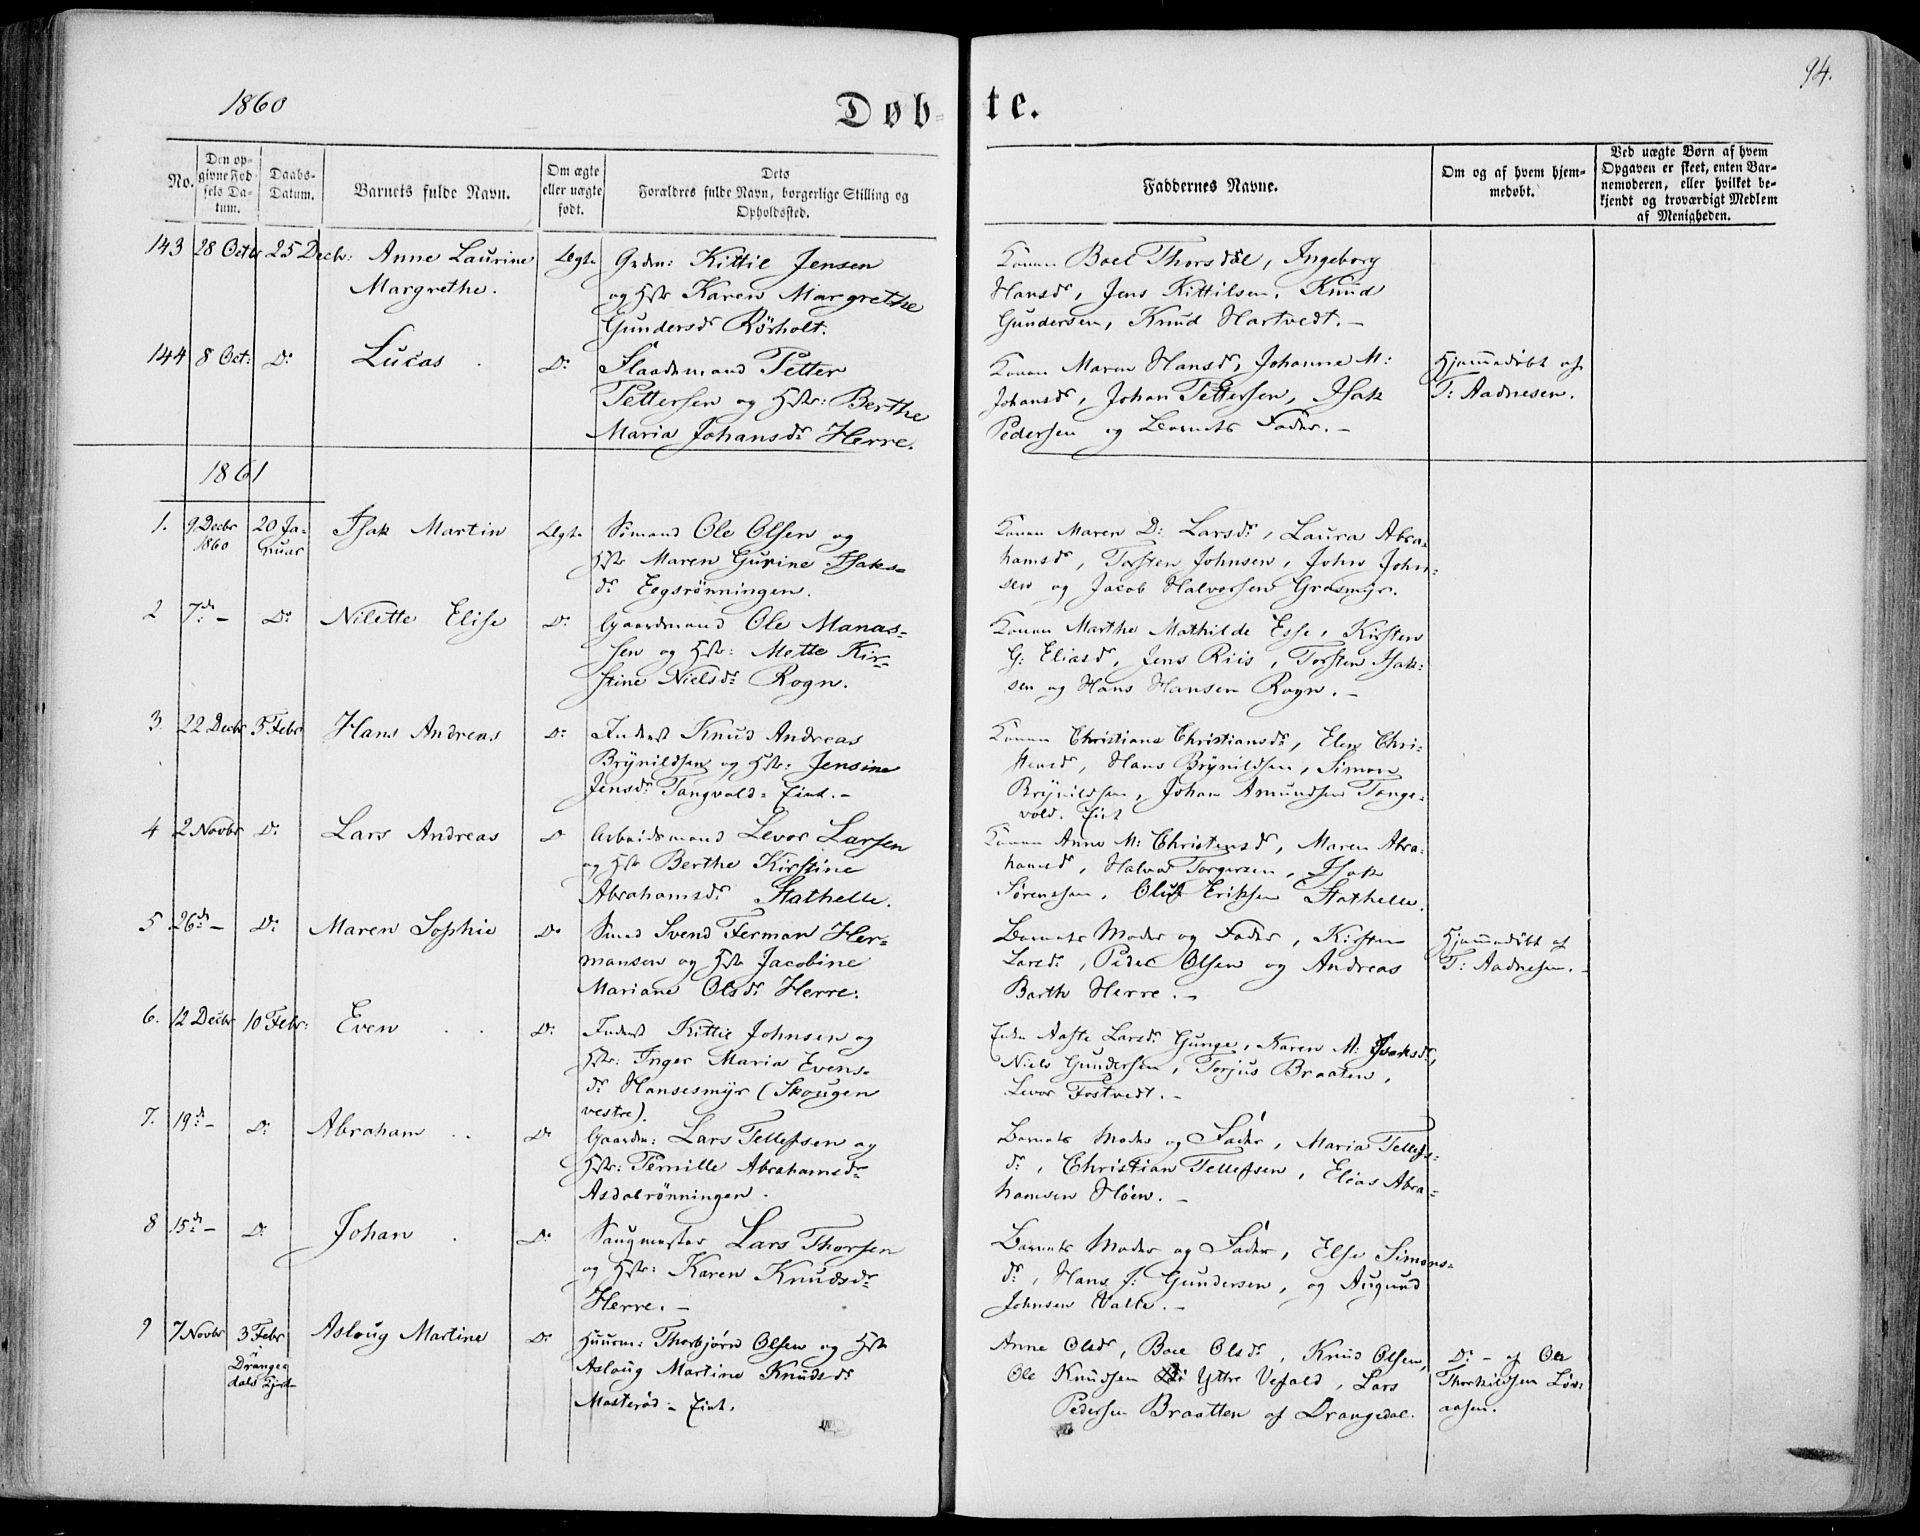 SAKO, Bamble kirkebøker, F/Fa/L0005: Ministerialbok nr. I 5, 1854-1869, s. 94